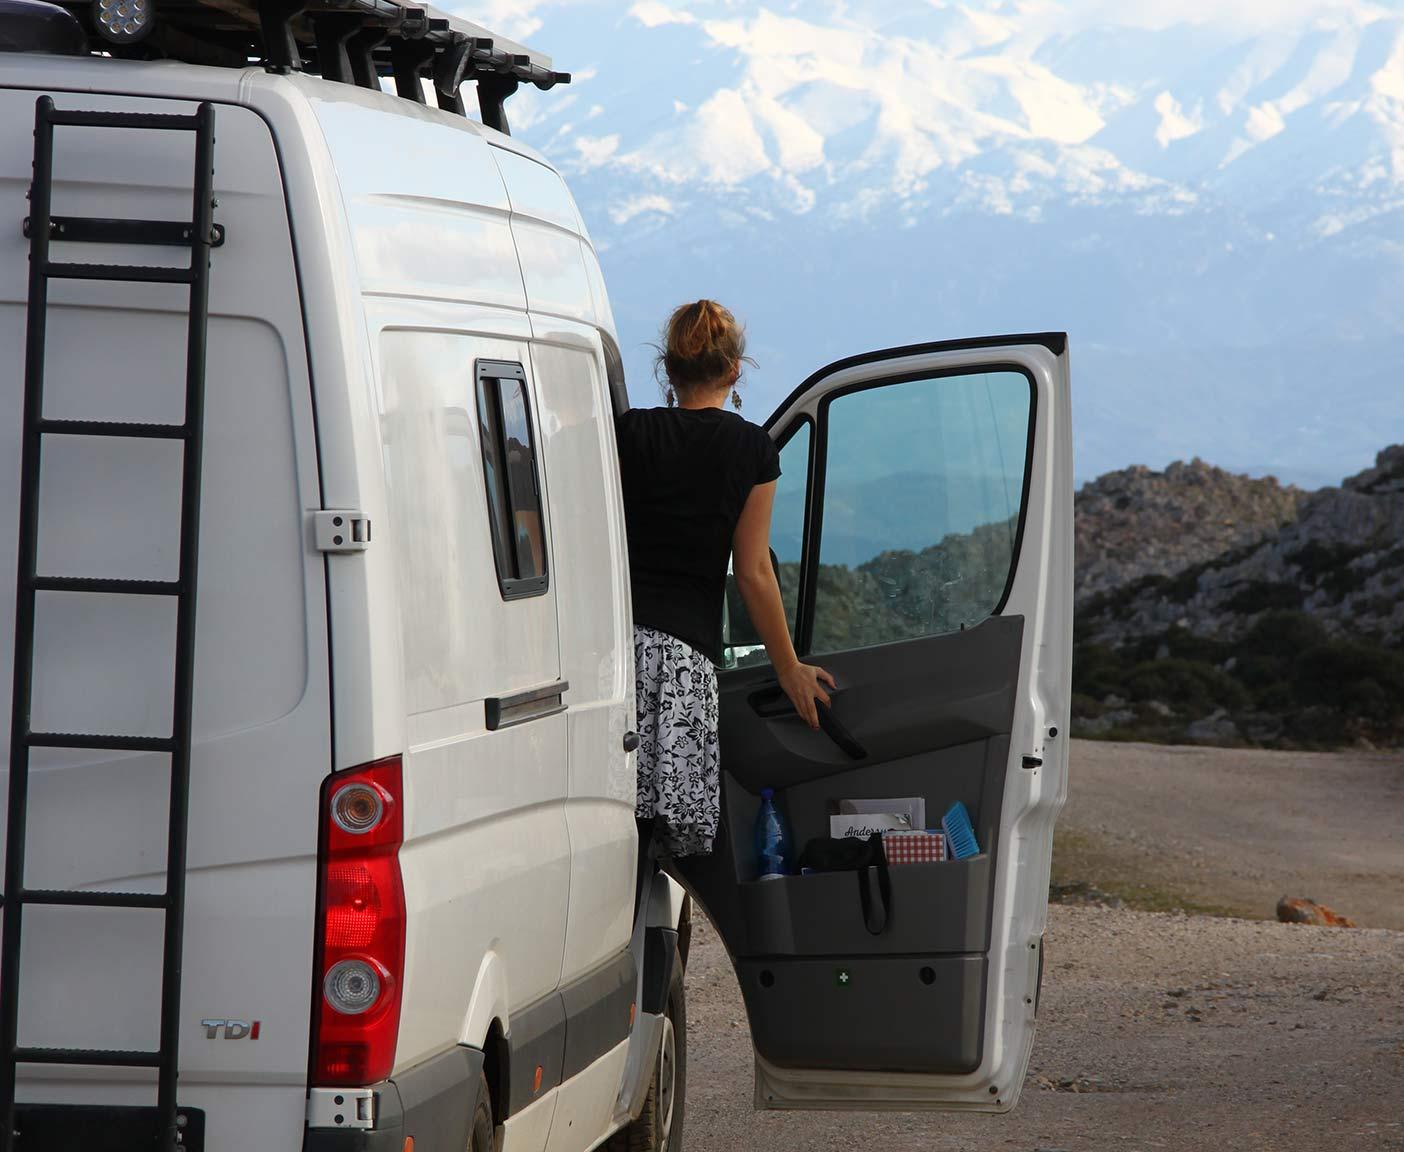 VW-crafter-preis-california-norwegen-4x4-kastenwagen